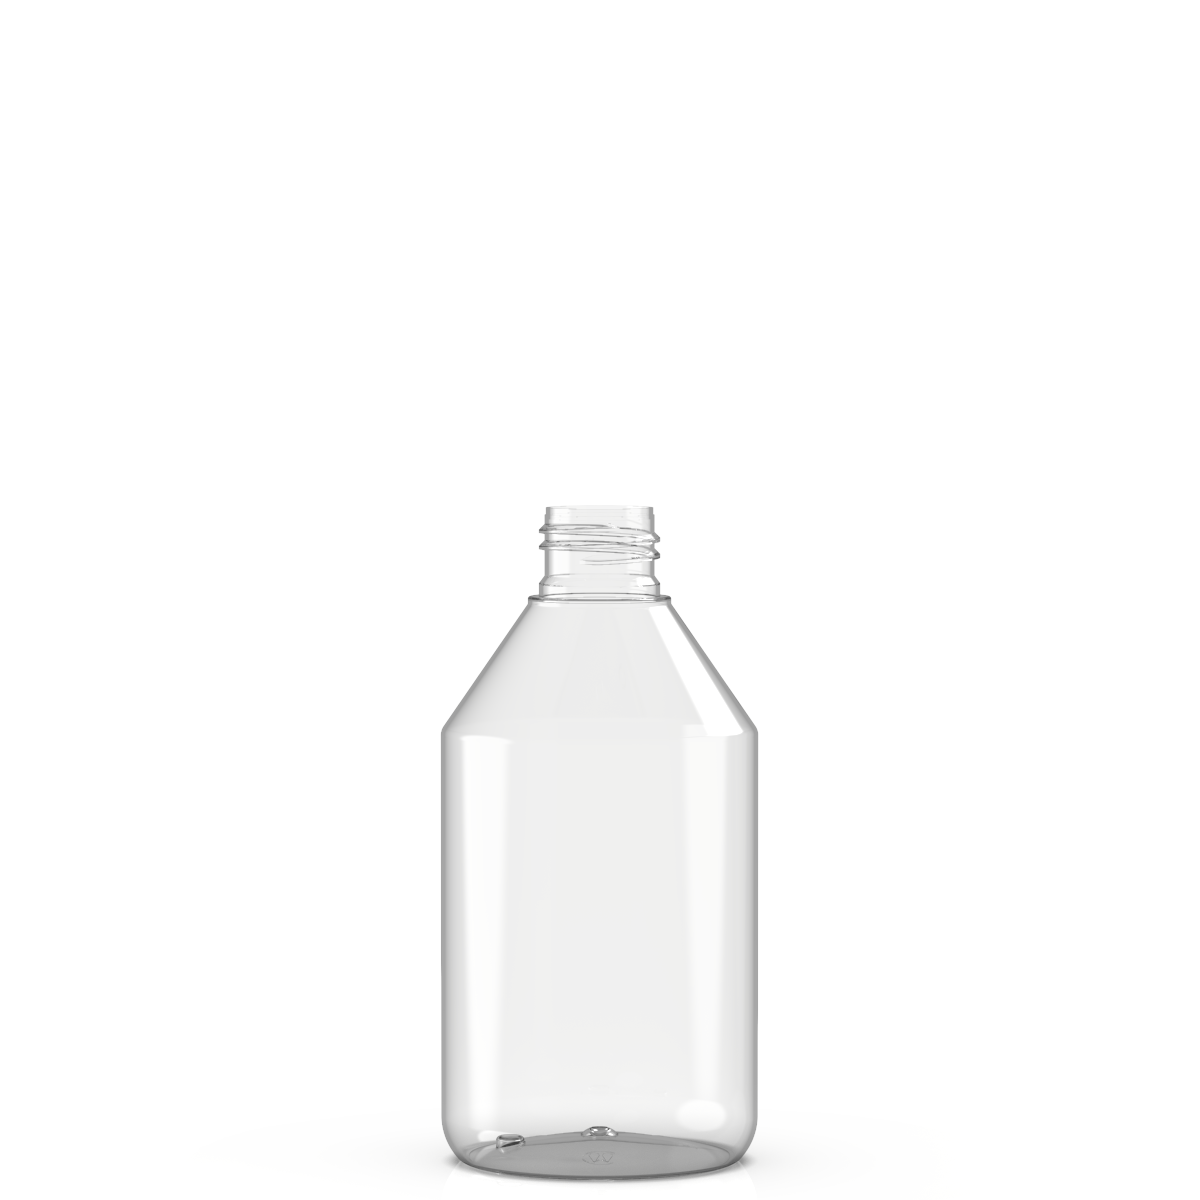 Round bottle 250 ml PET, neck 24/410, style BERNA